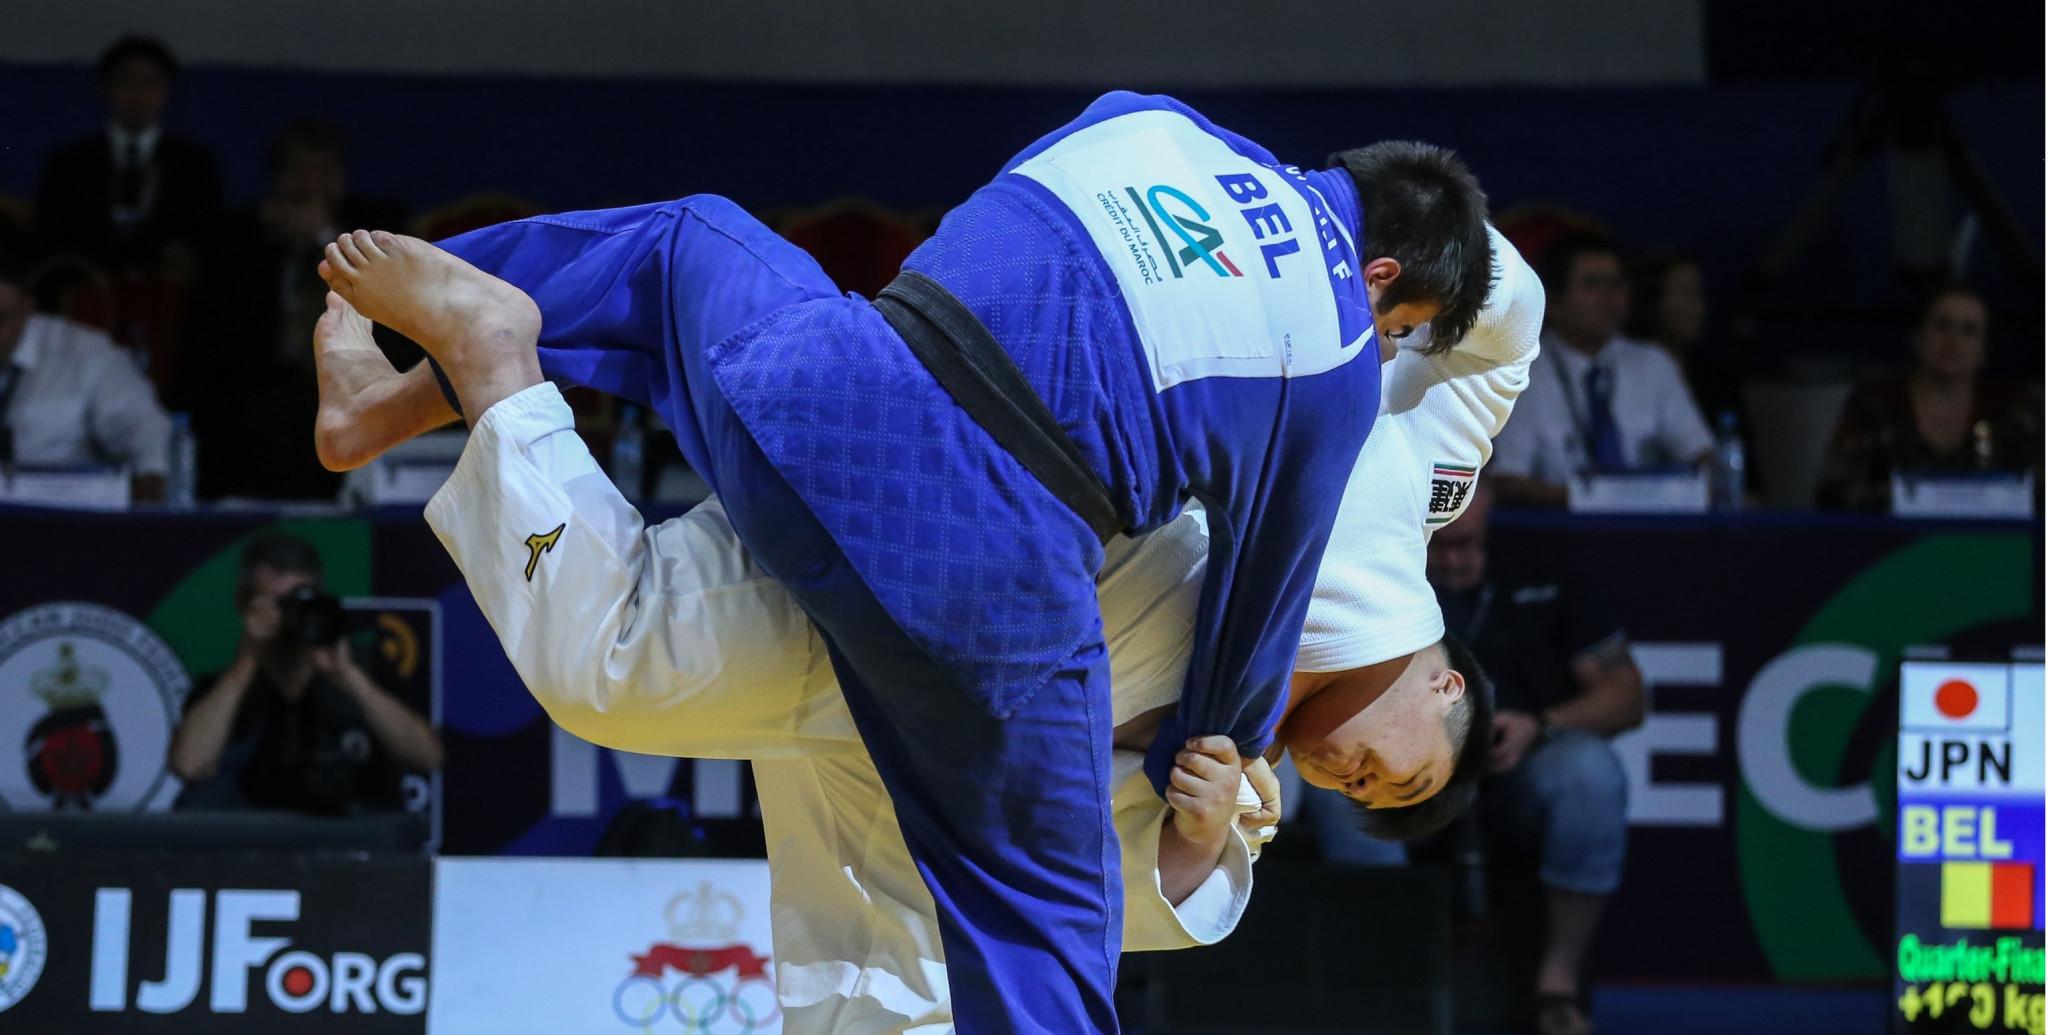 Sosuke Matsumura claimed the gold medal in the men's over-100kg category ©IJF/Di Feliciantonio Emanuele